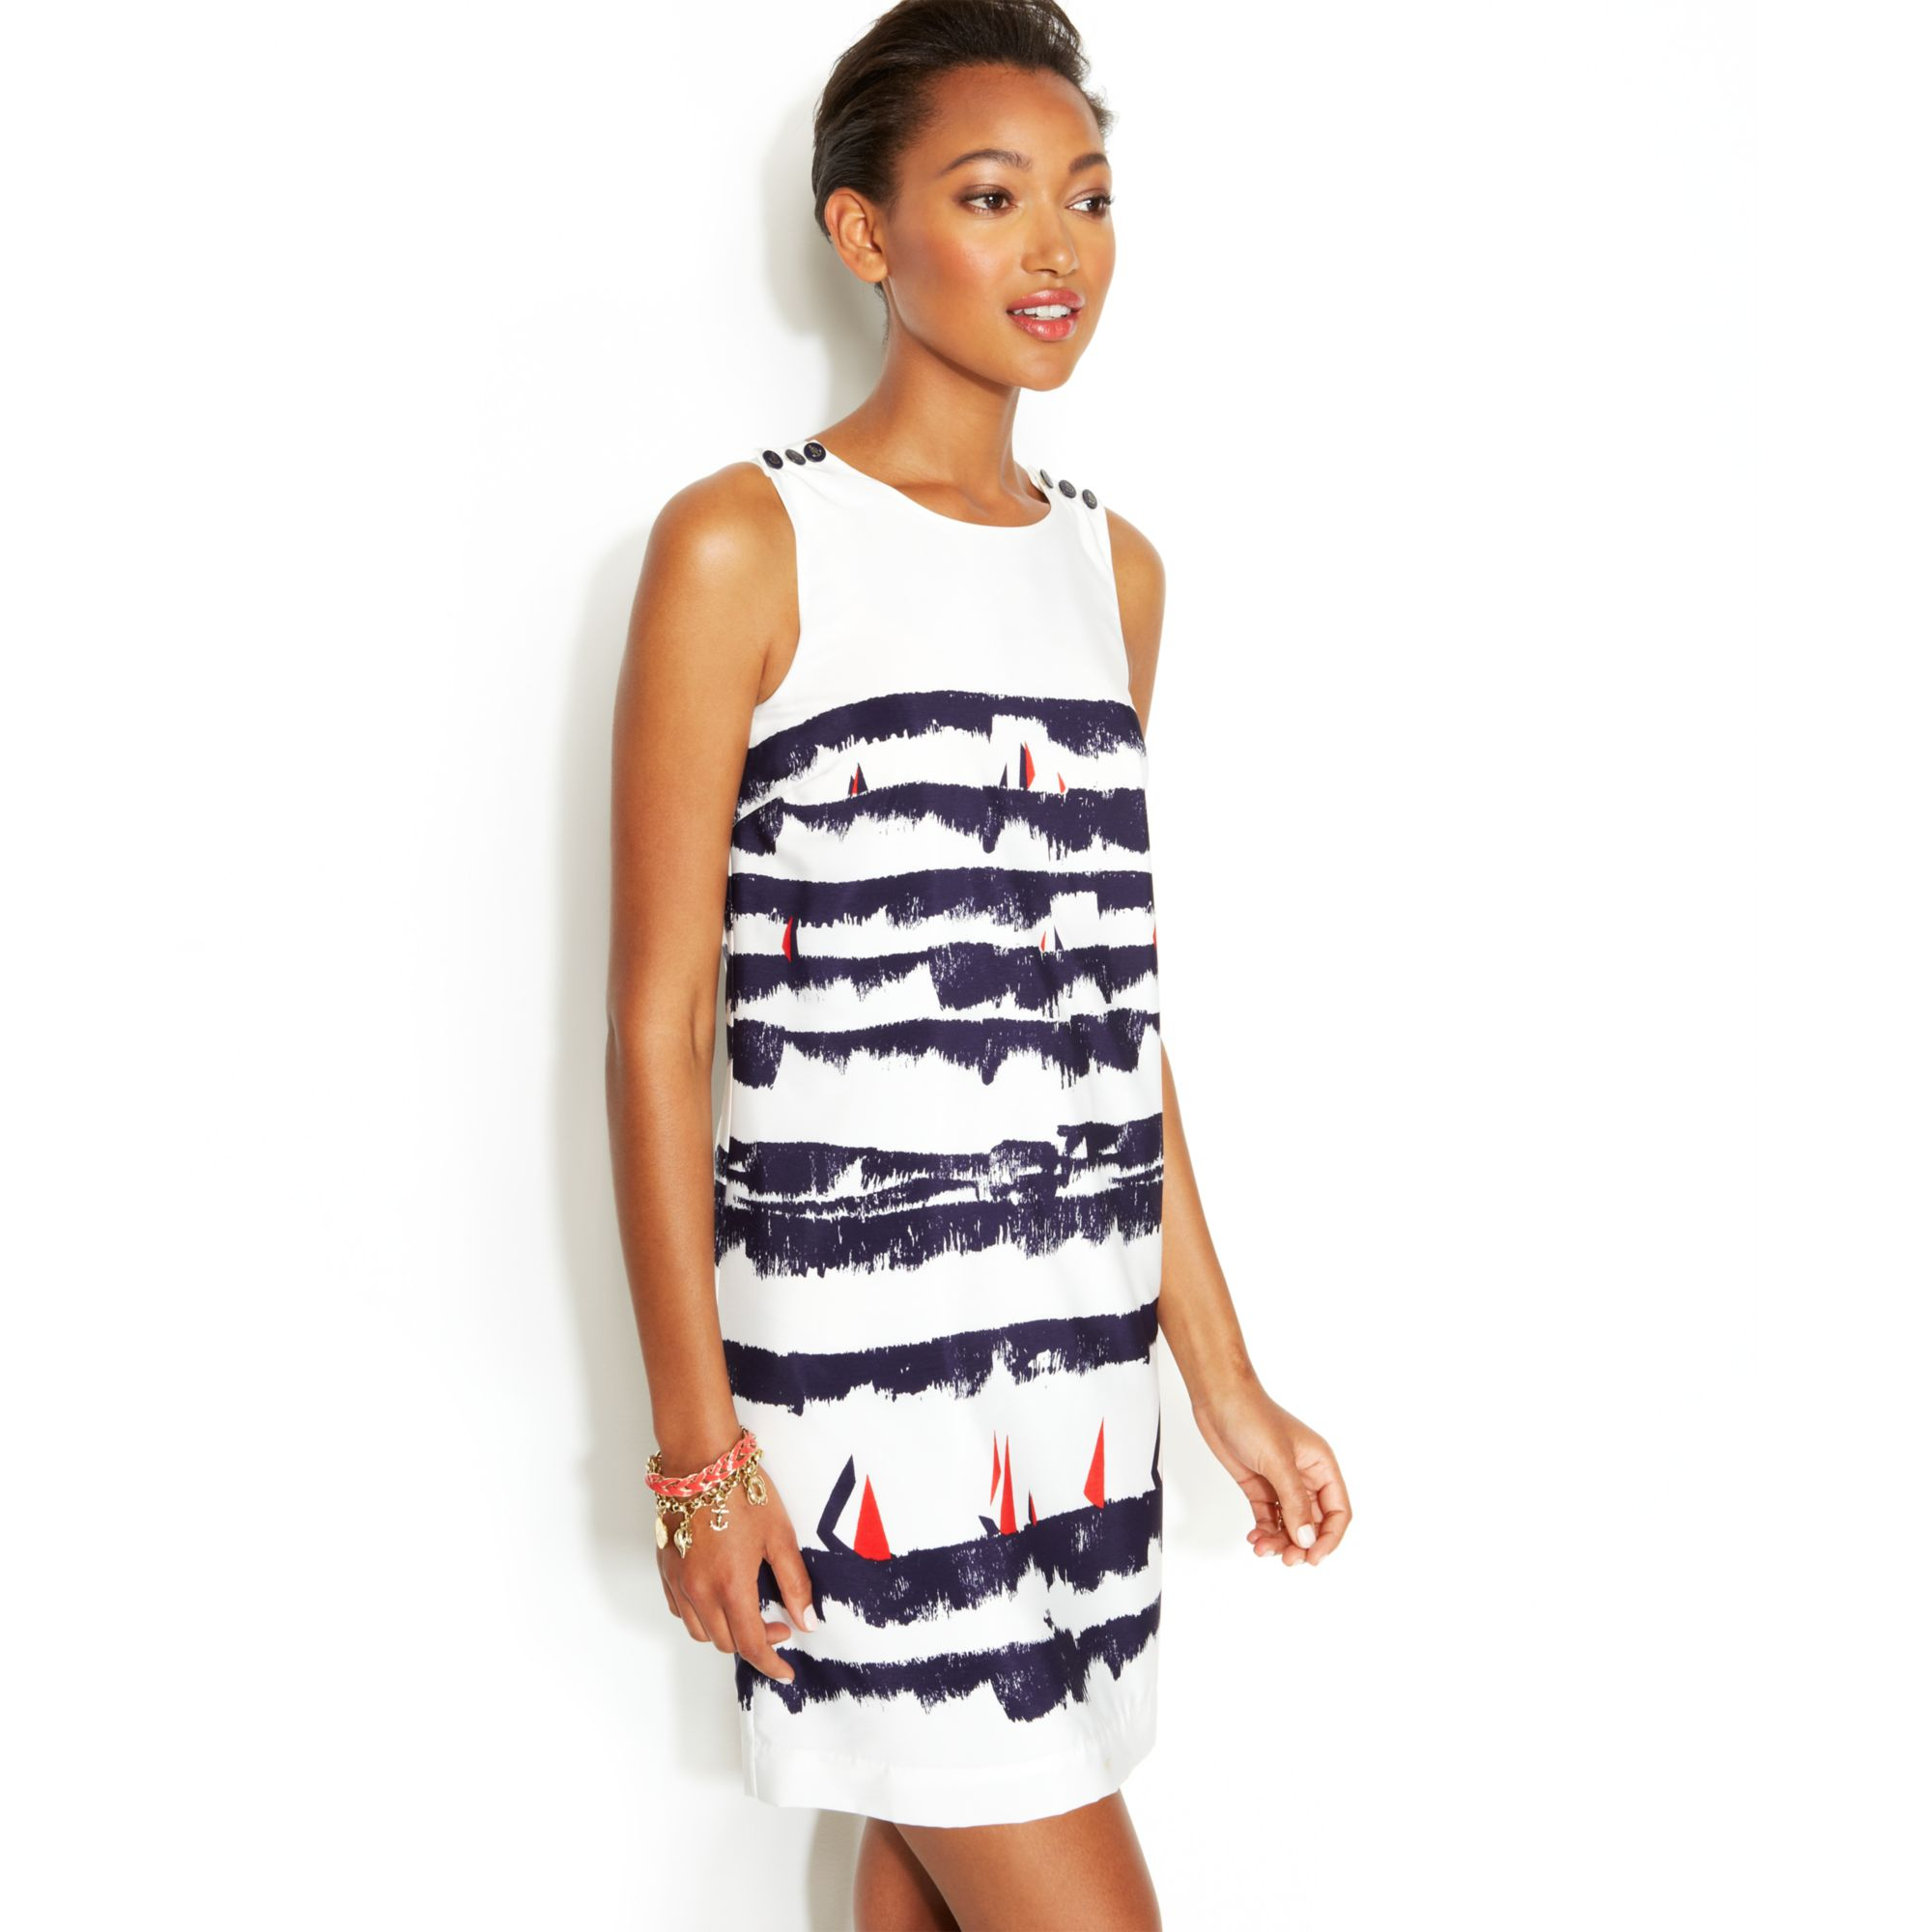 502edb47fc0 Tommy Hilfiger Sleeveless Printed Buttonshoulder Shift Dress in ...